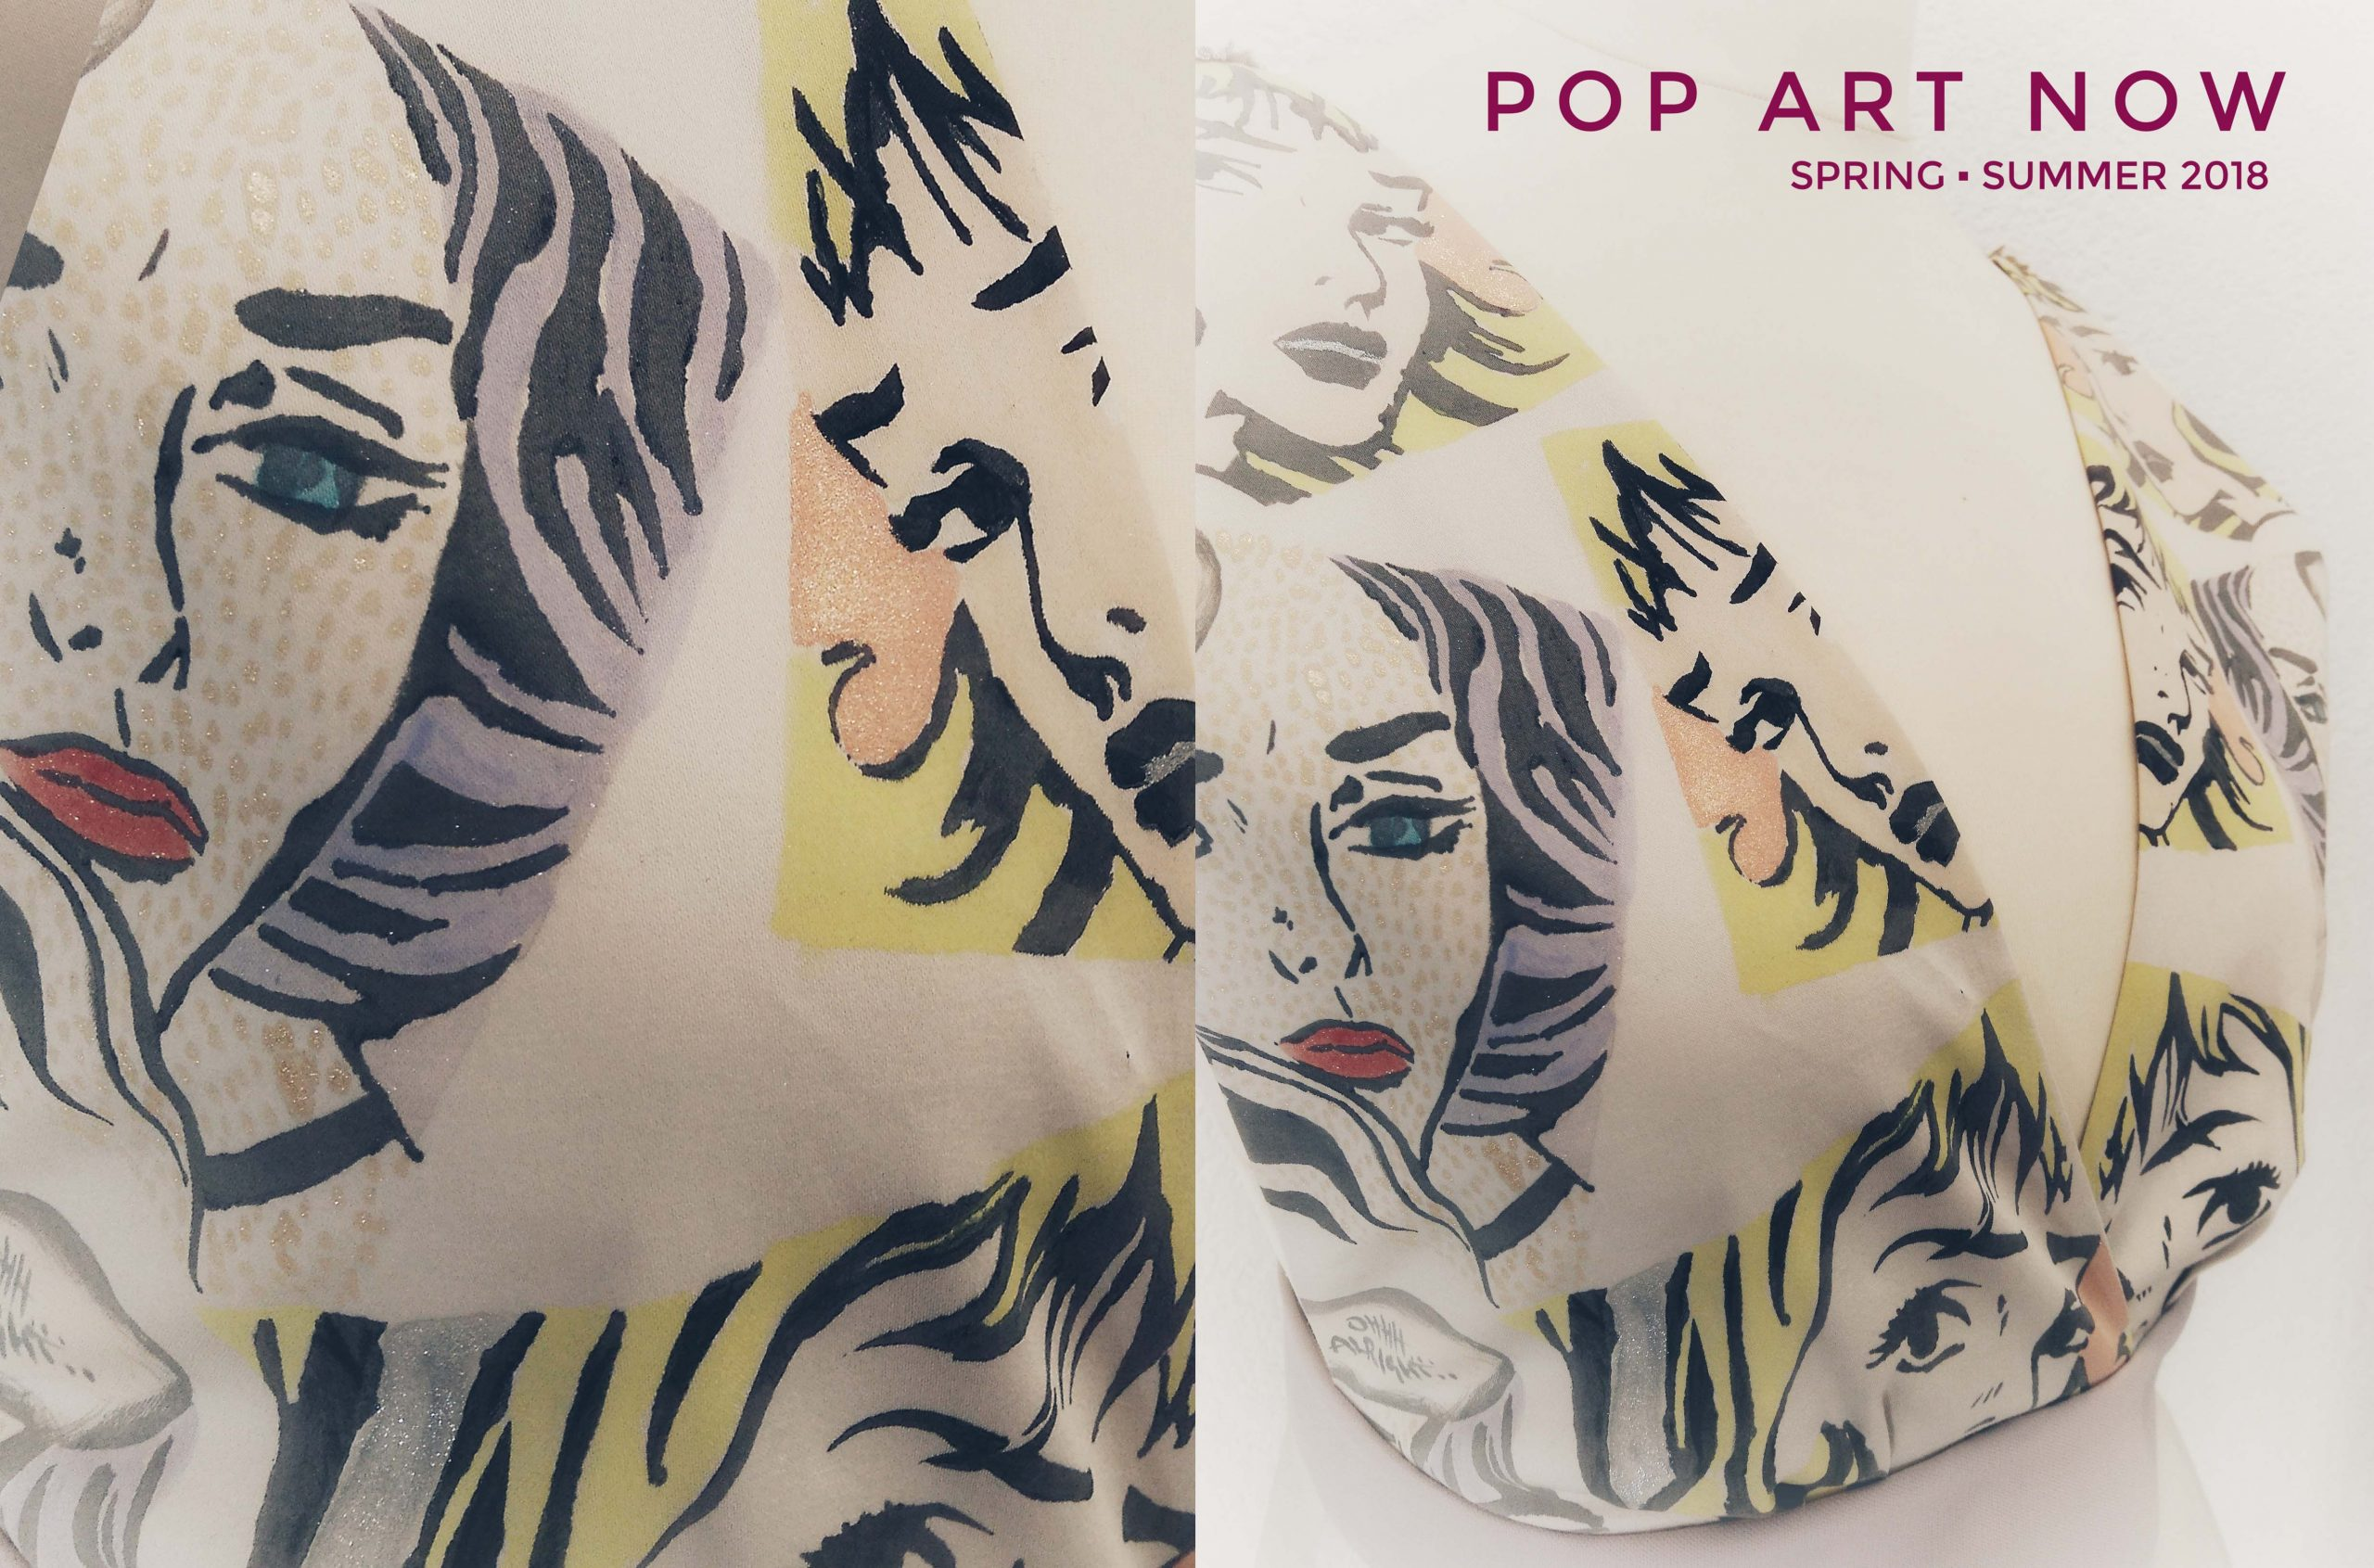 POP ART NOW 001